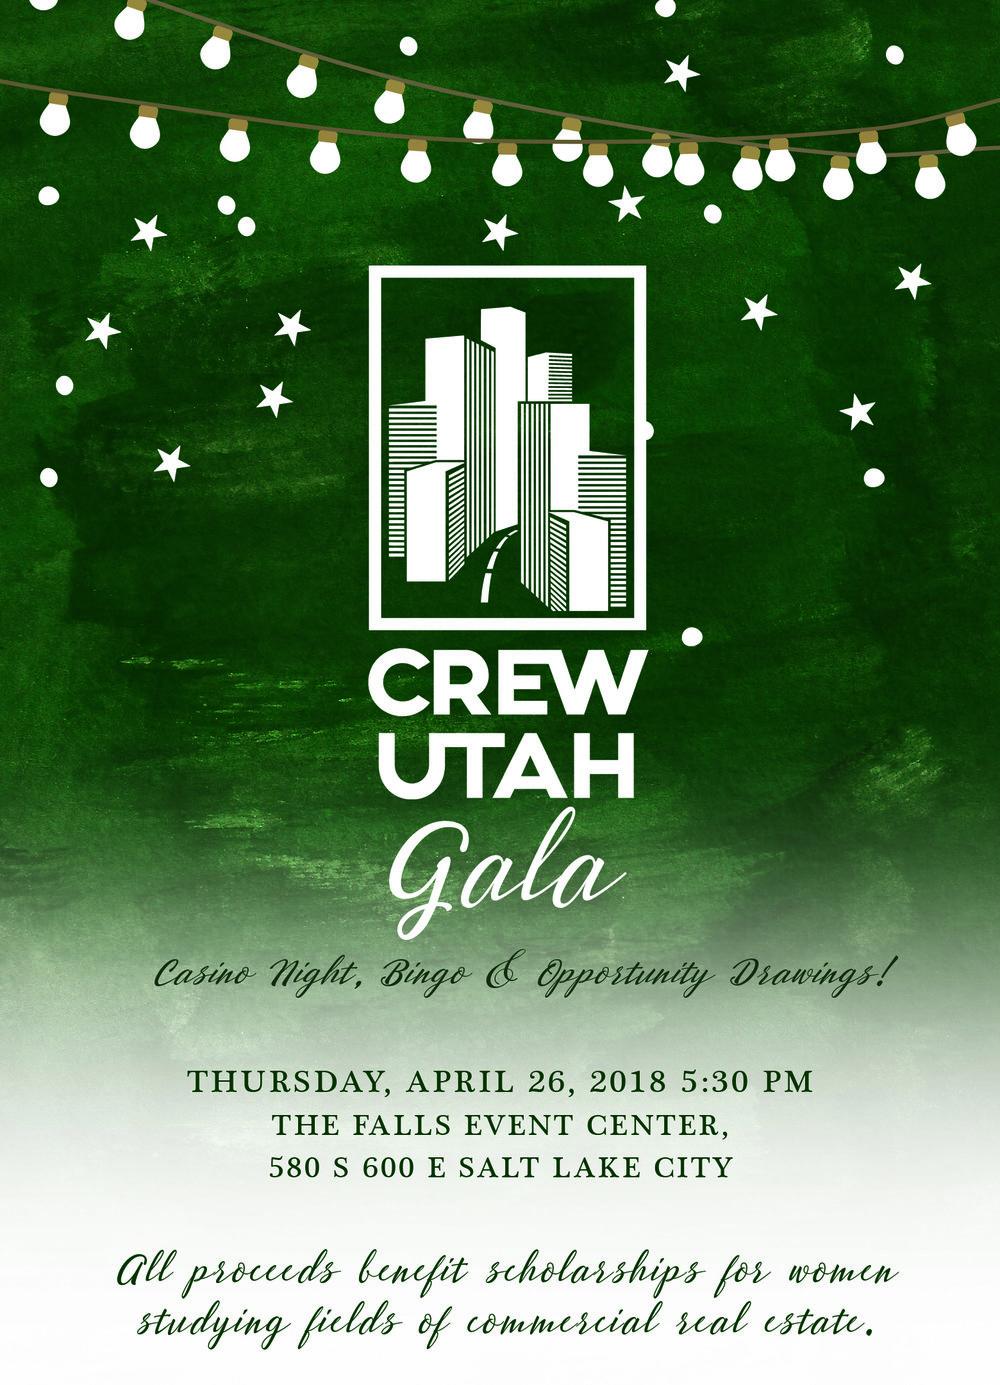 2018-02-11-CREW-Gala-Invite-A (002).jpg